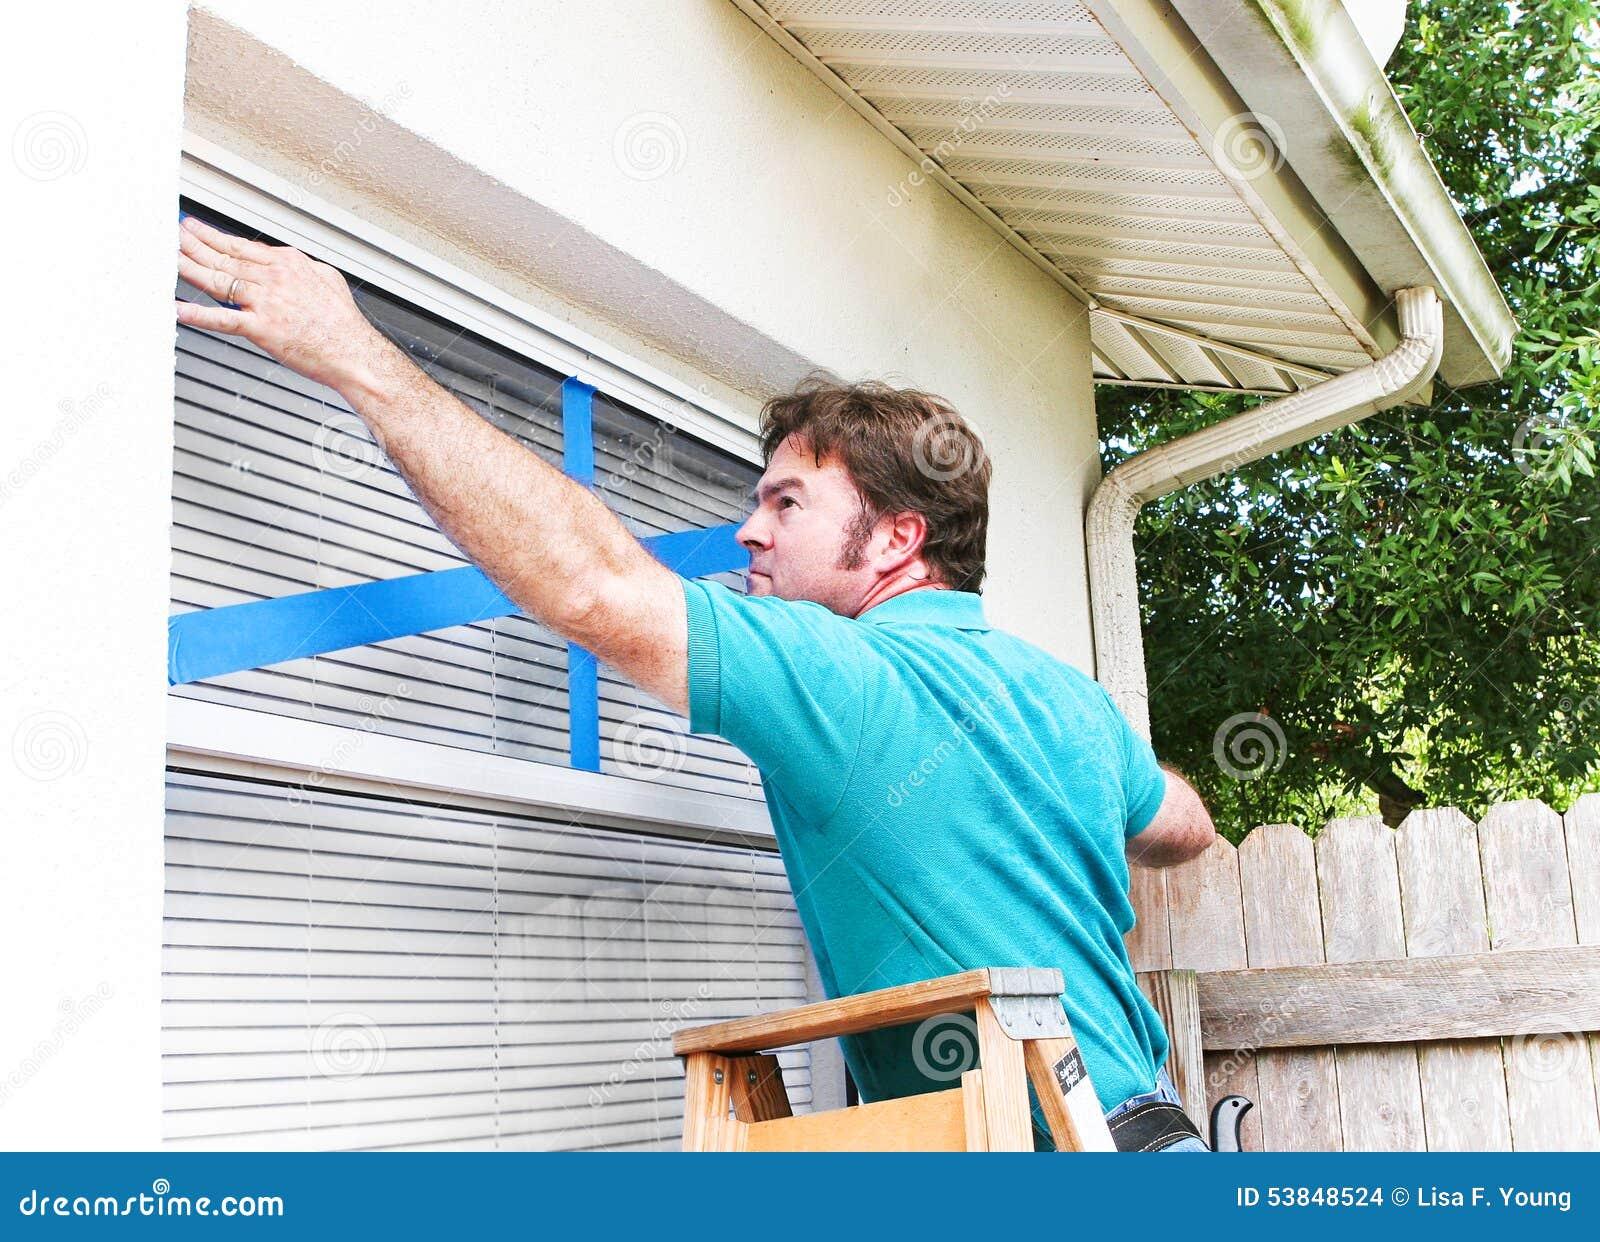 Homme attachant du ruban adhésif à son Windows